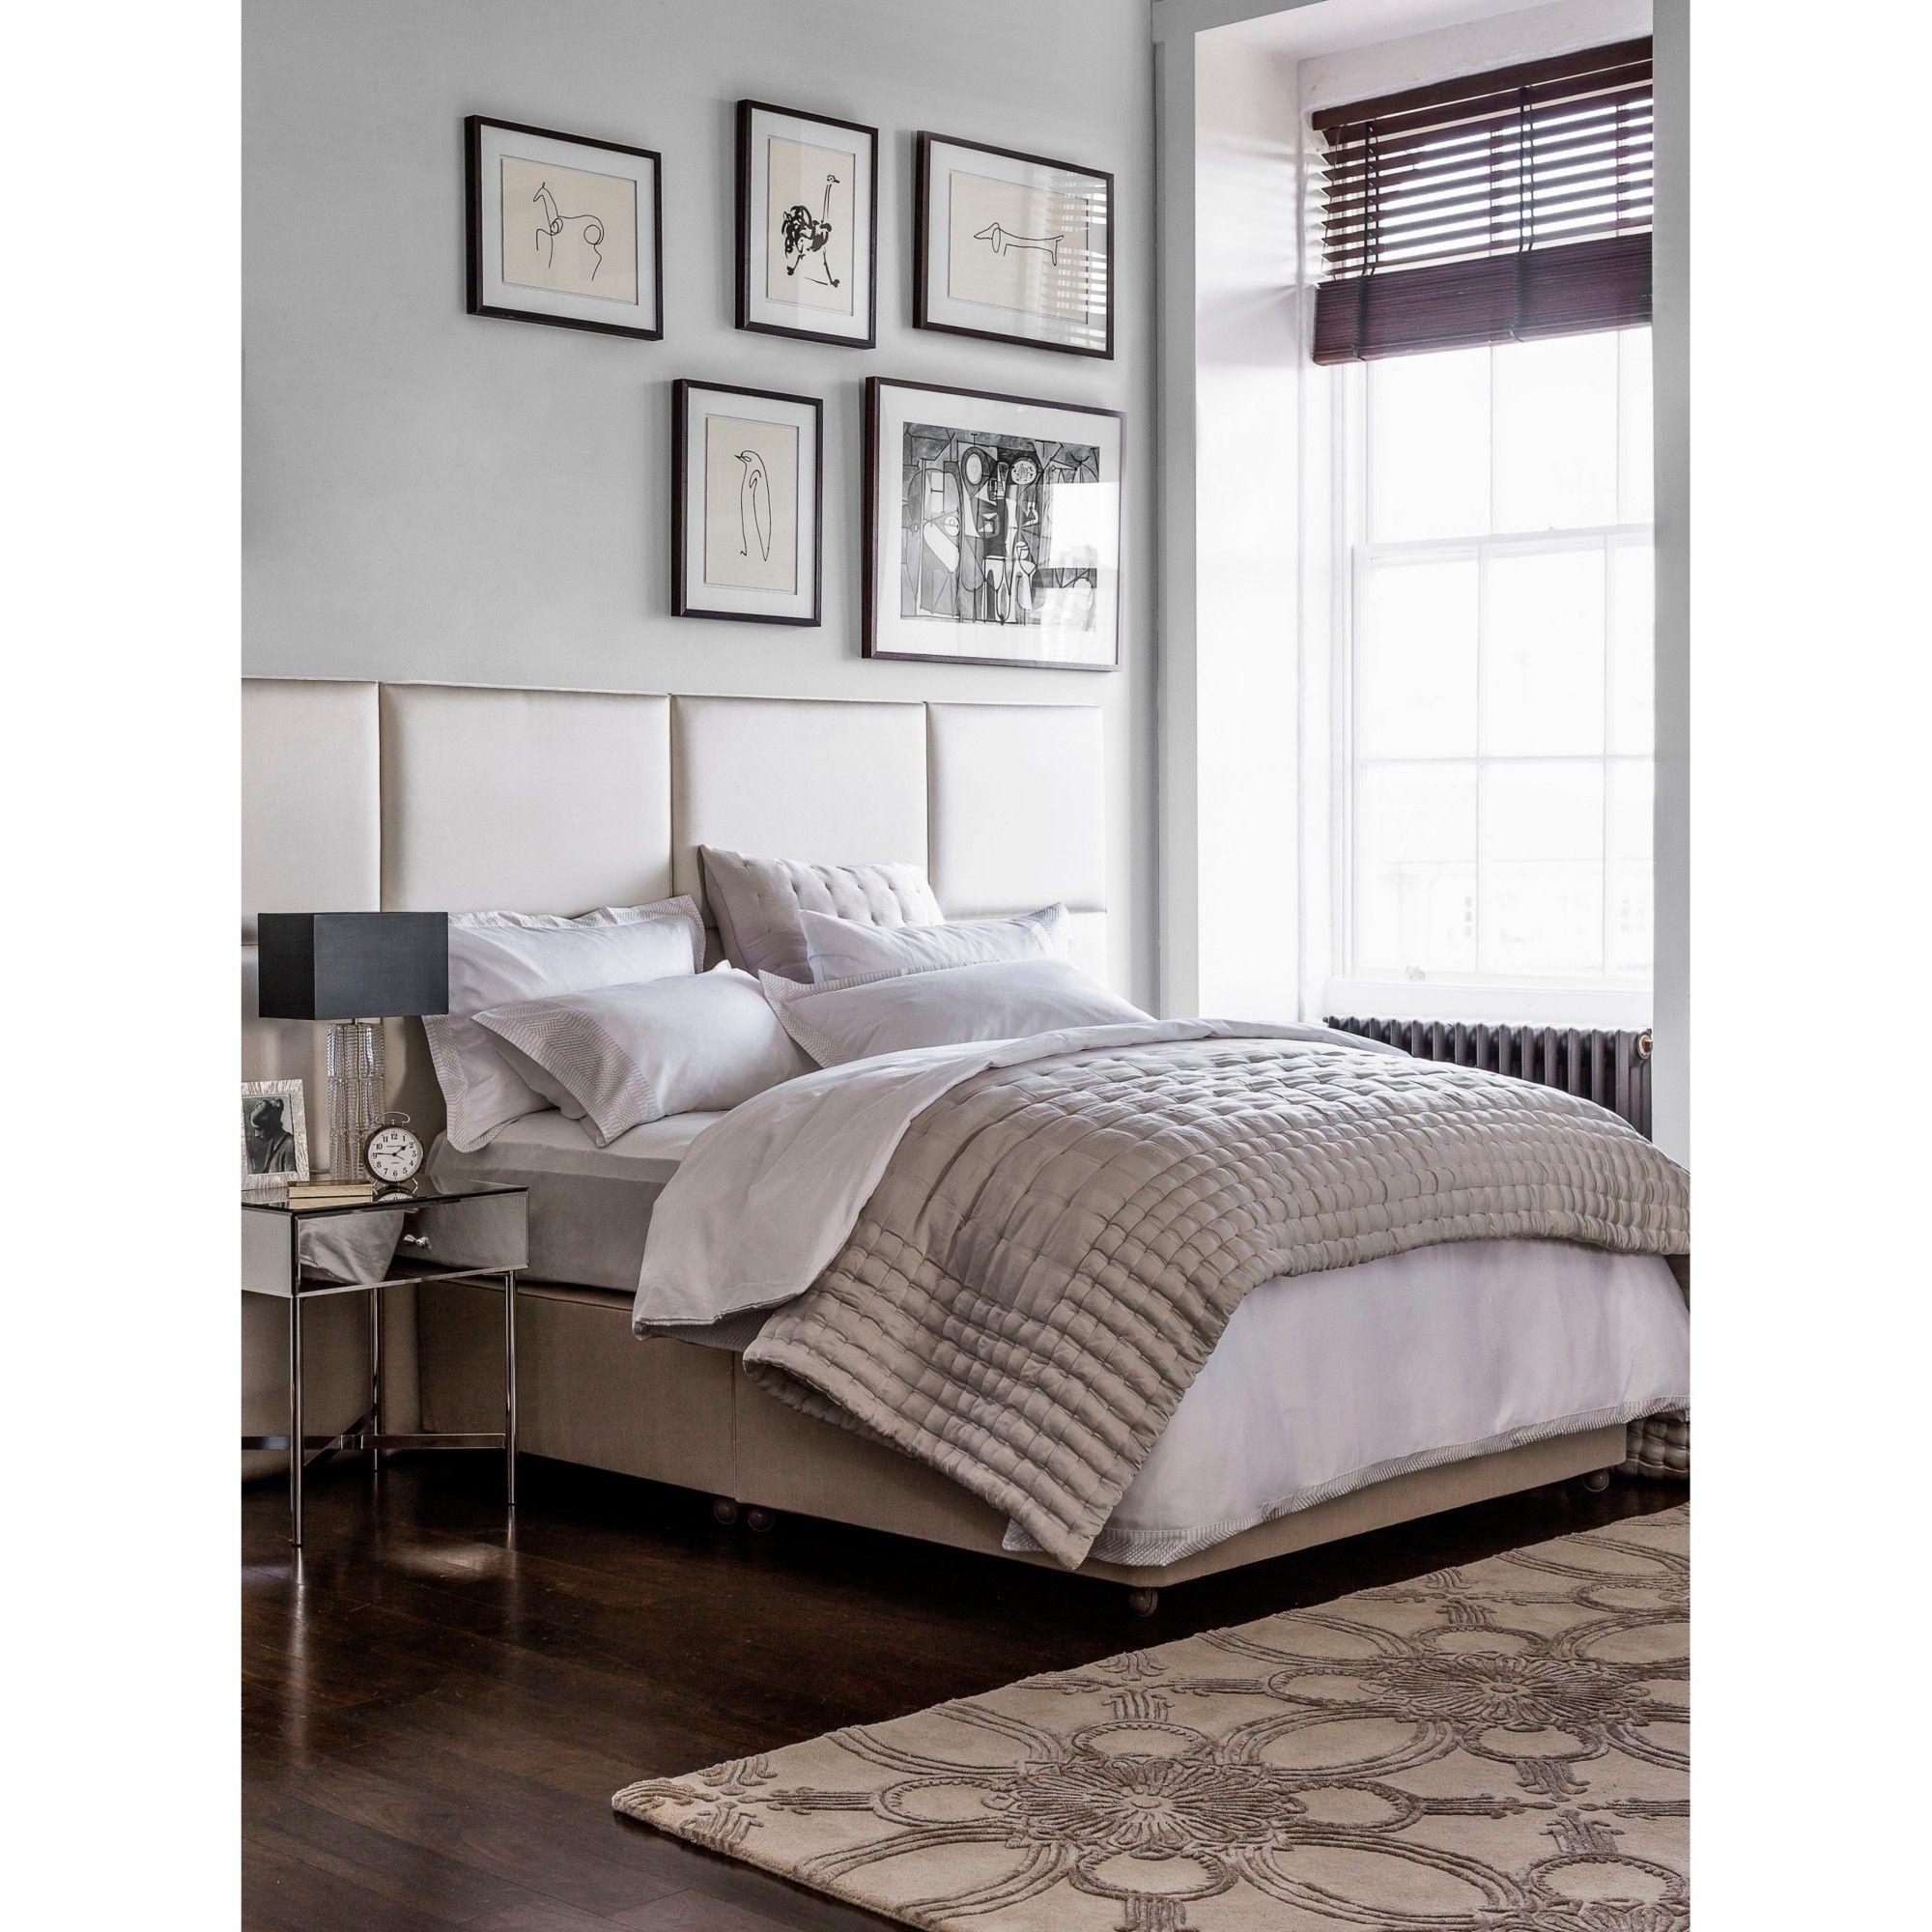 john lewis boutique hotel silk bedspread wolf grey bedspread